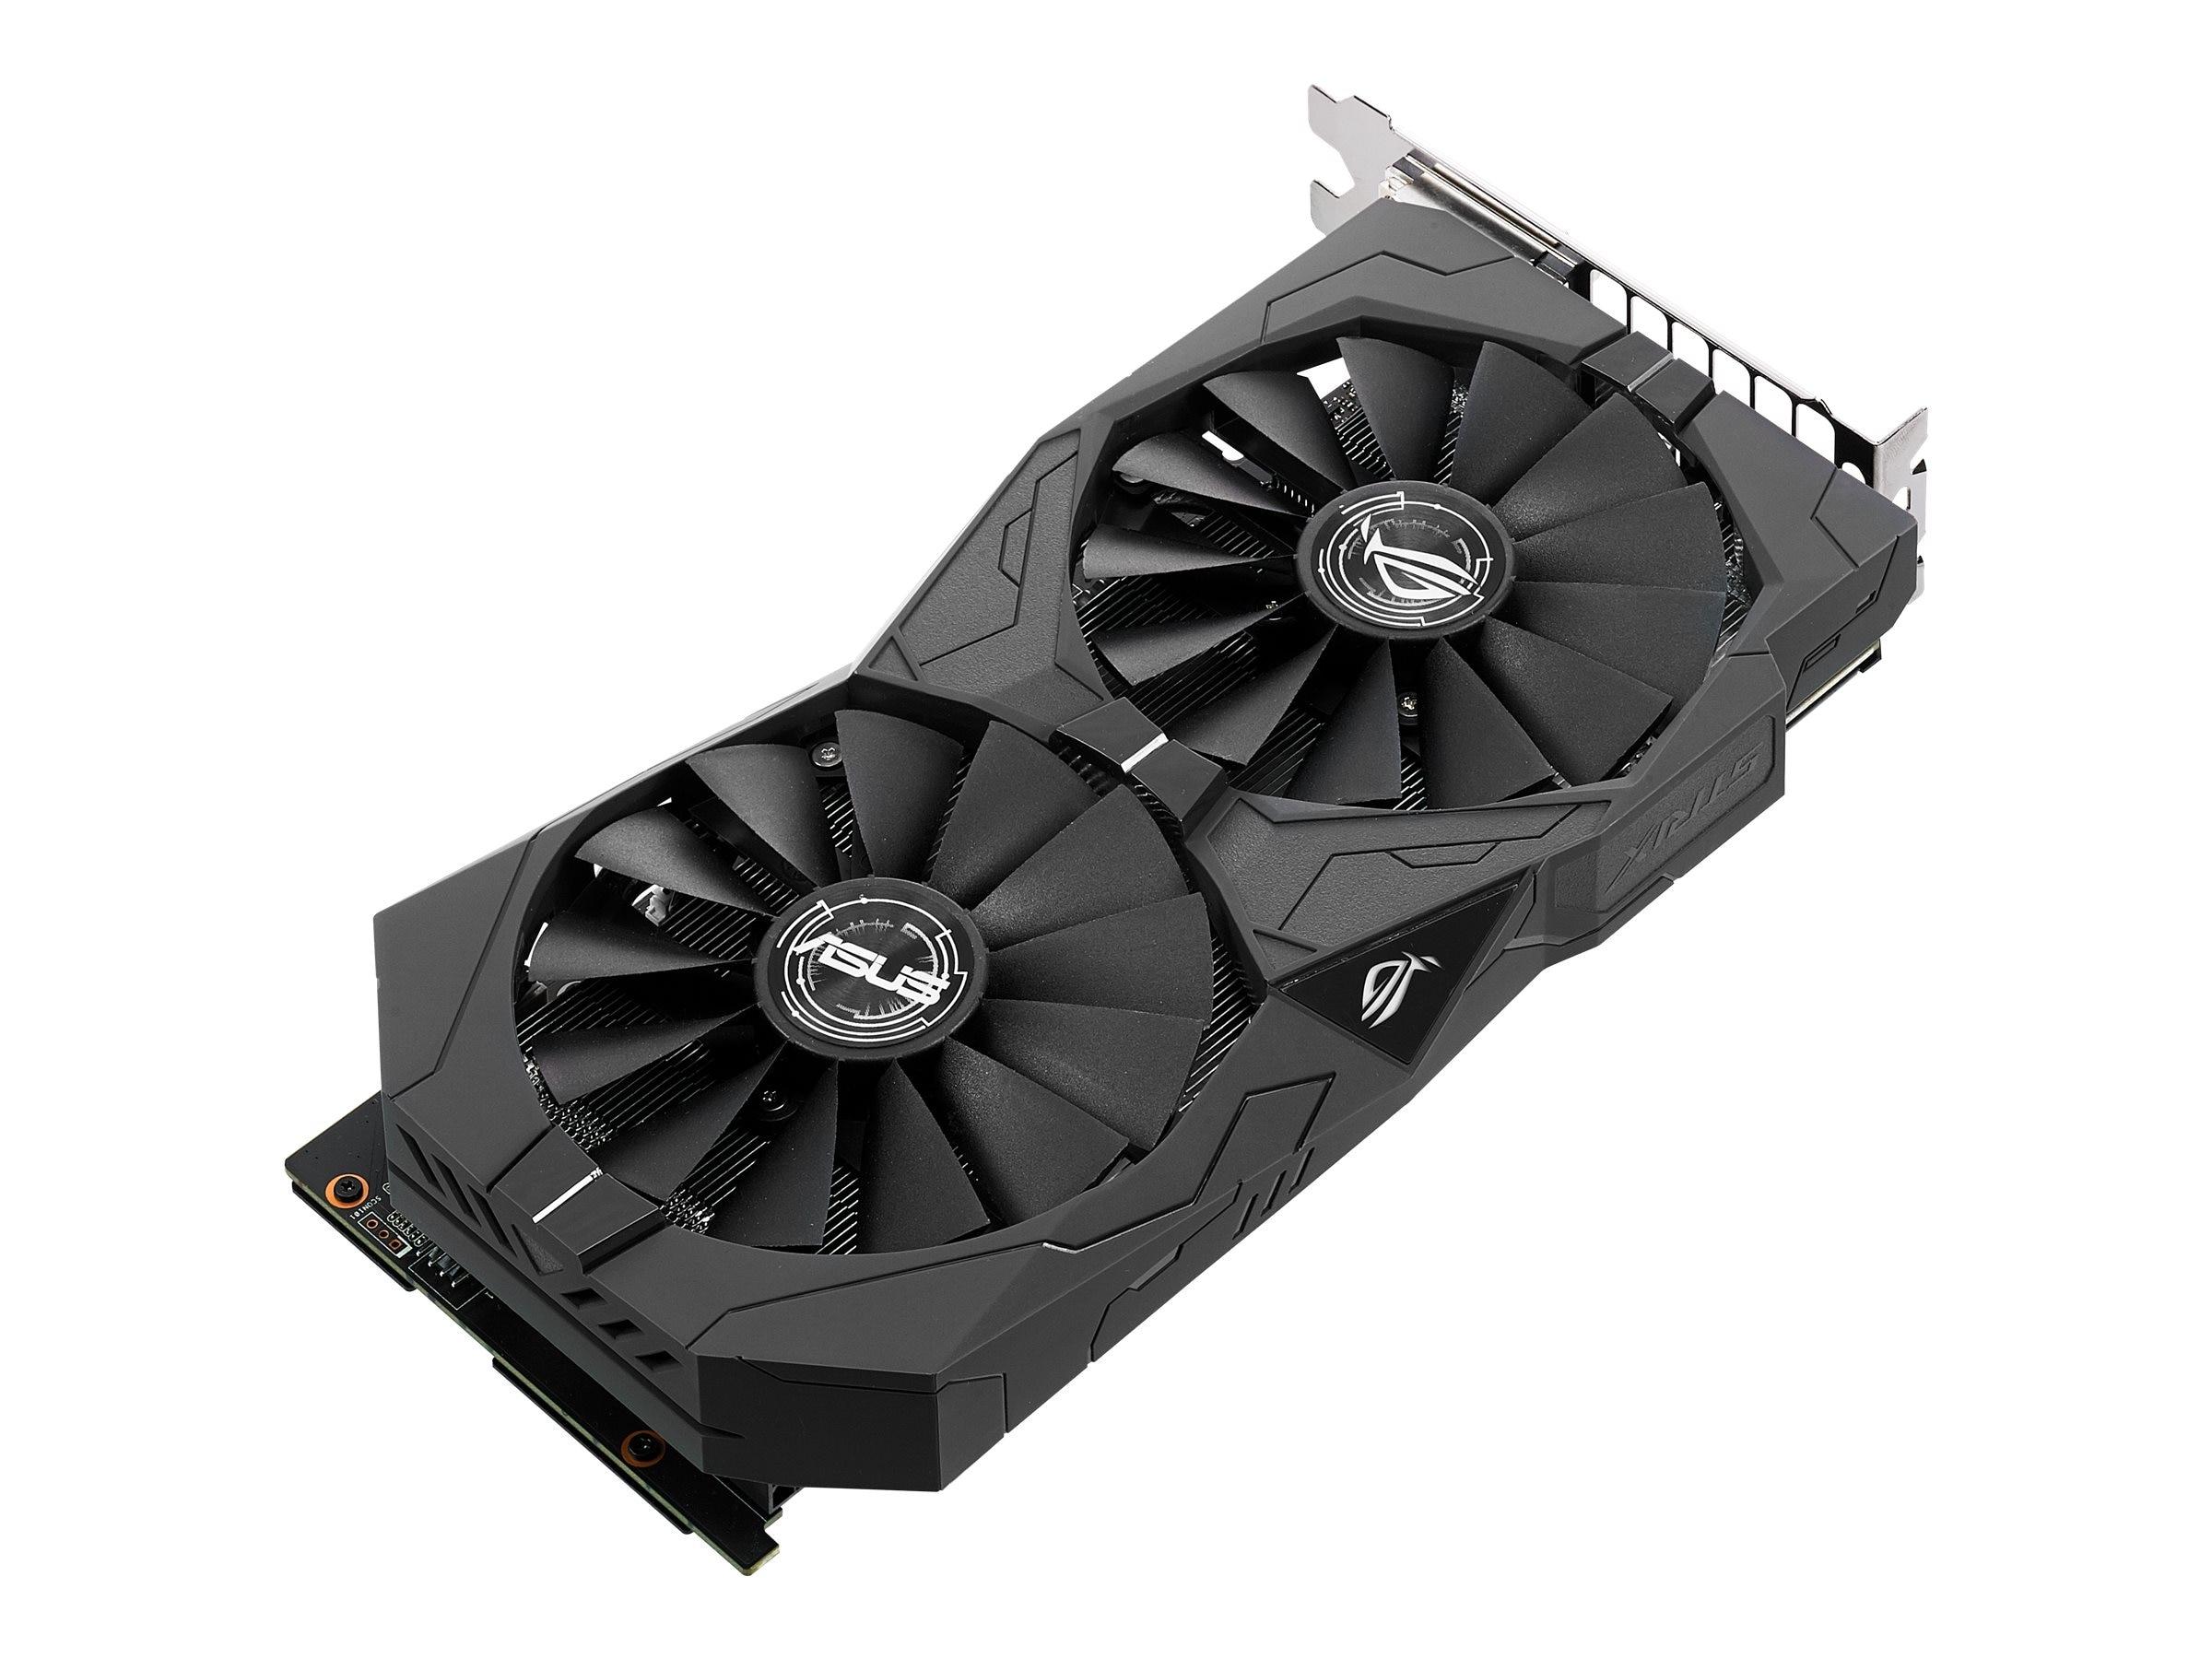 Asus NVIDIA GeForce GTX 1050 TI PCIe 3.0 Graphics Card, 4GB GDDR5, STRIX-GTX1050TI-O4G-GAMING, 33951110, Graphics/Video Accelerators